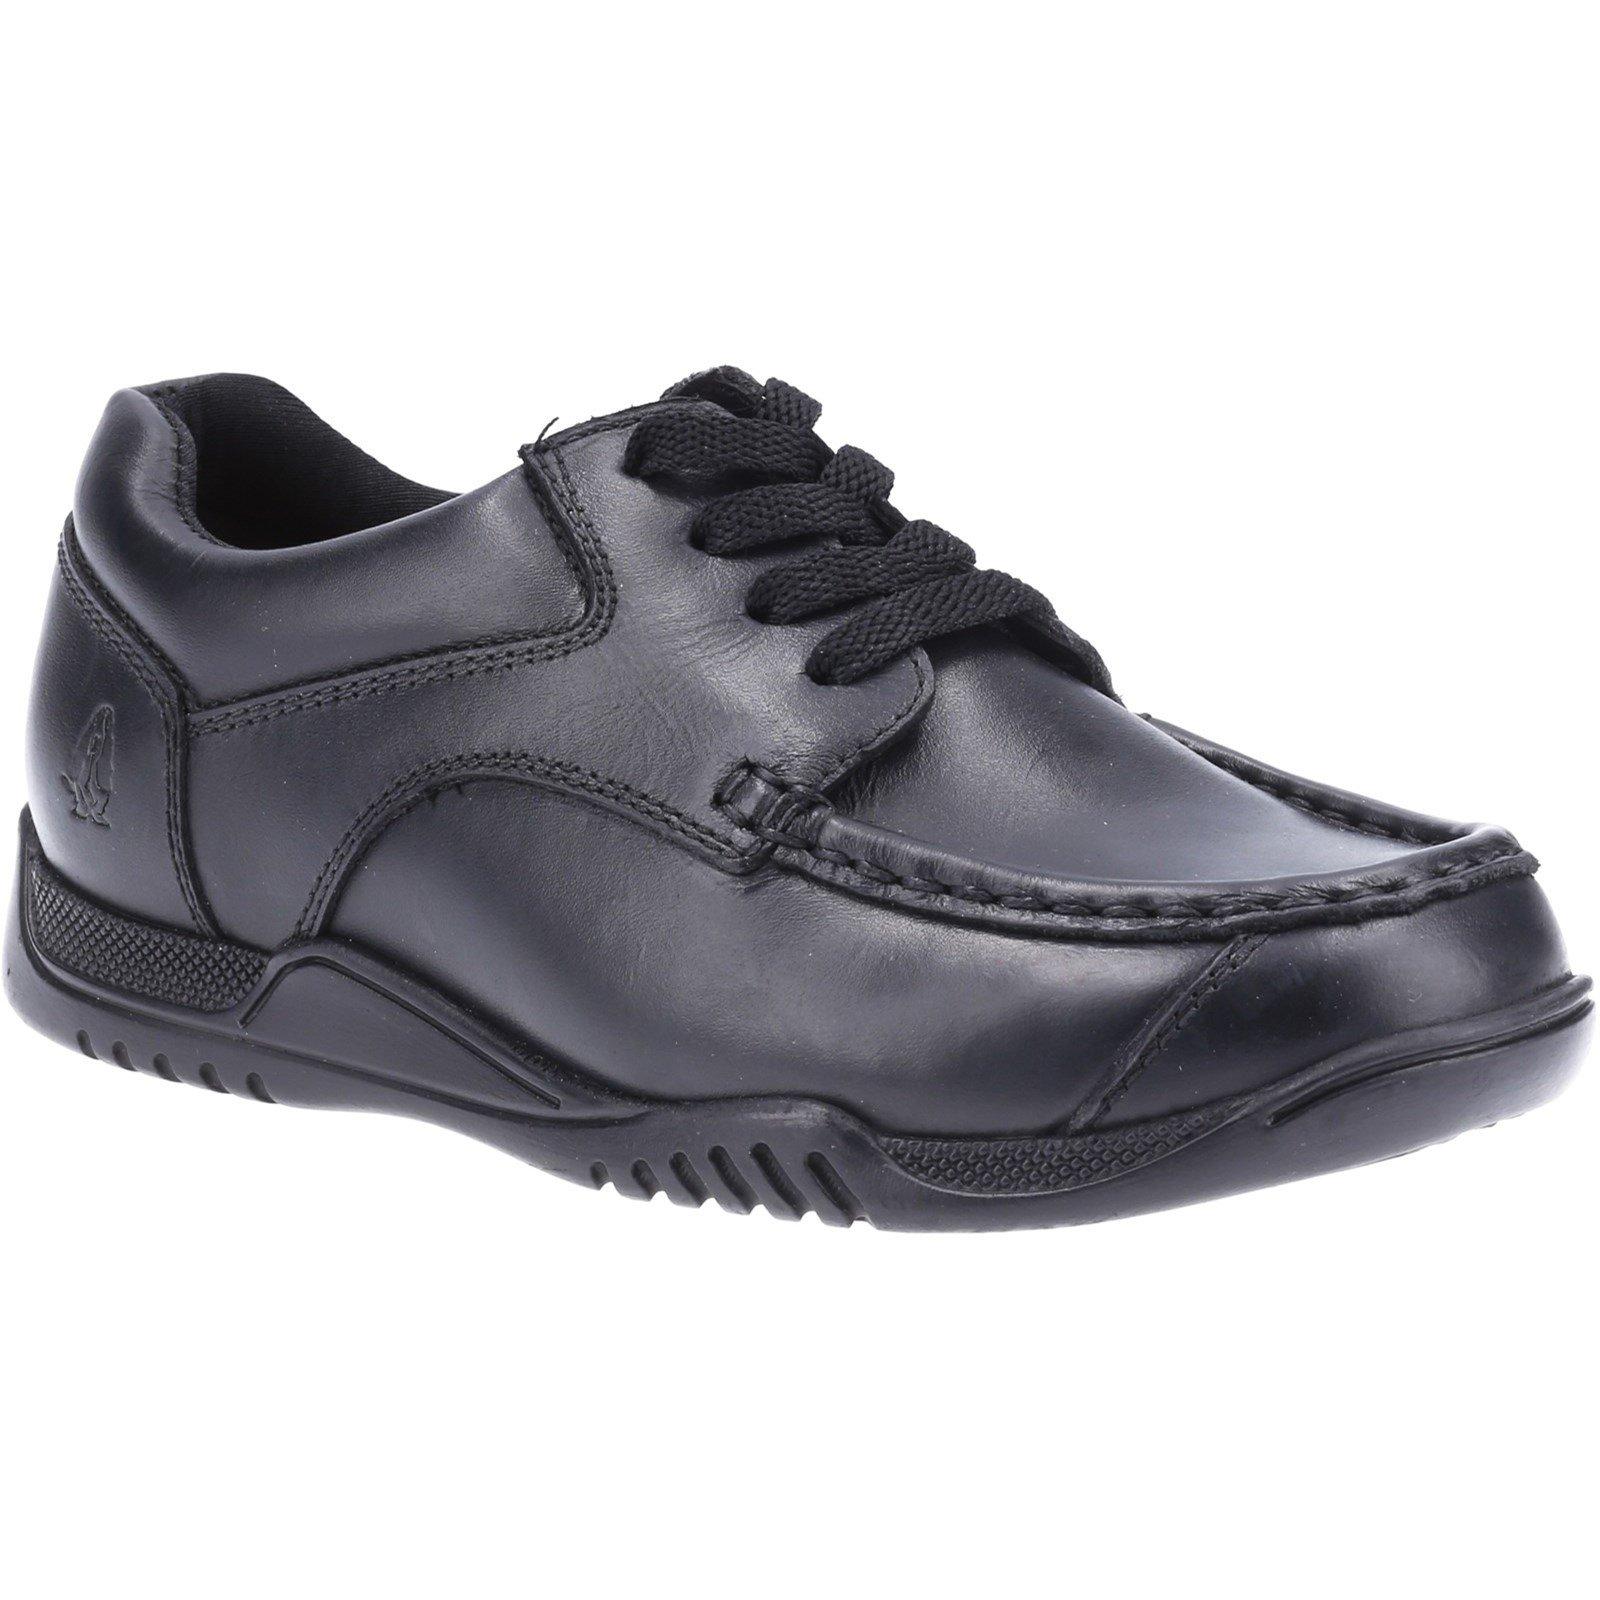 Hush Puppies Kid's Hudson Senior School Shoe Black 32583 - Black 6